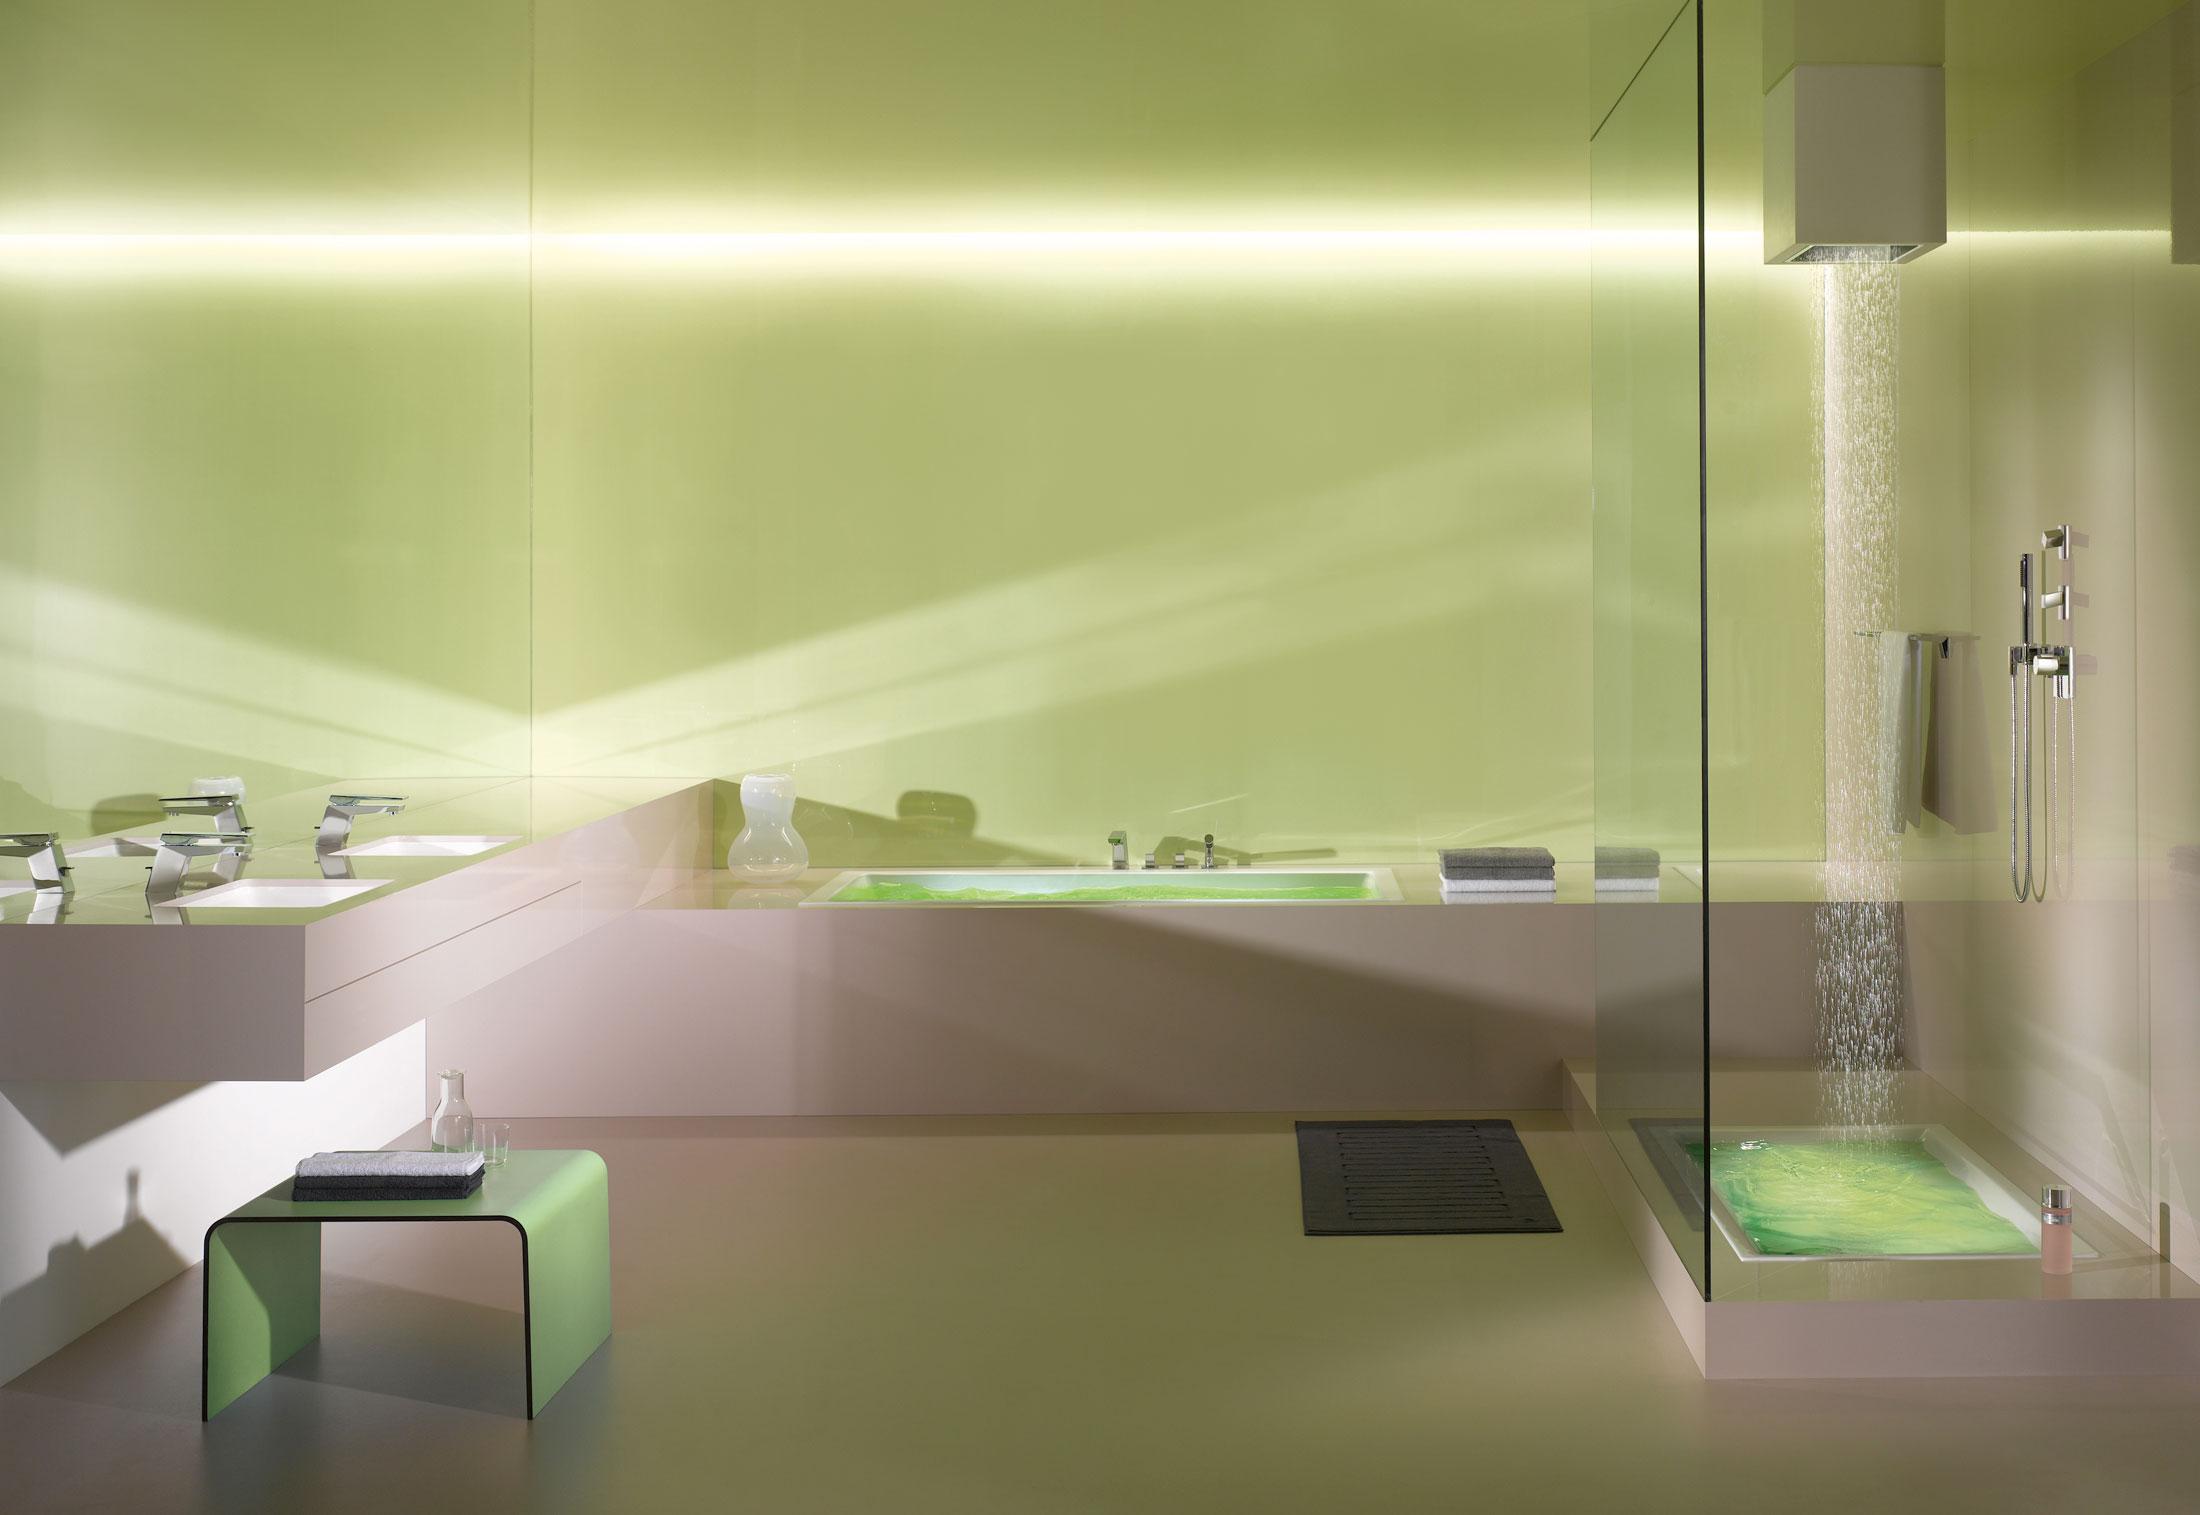 Supernova Deck-mounted bath shower set by Dornbracht | STYLEPARK